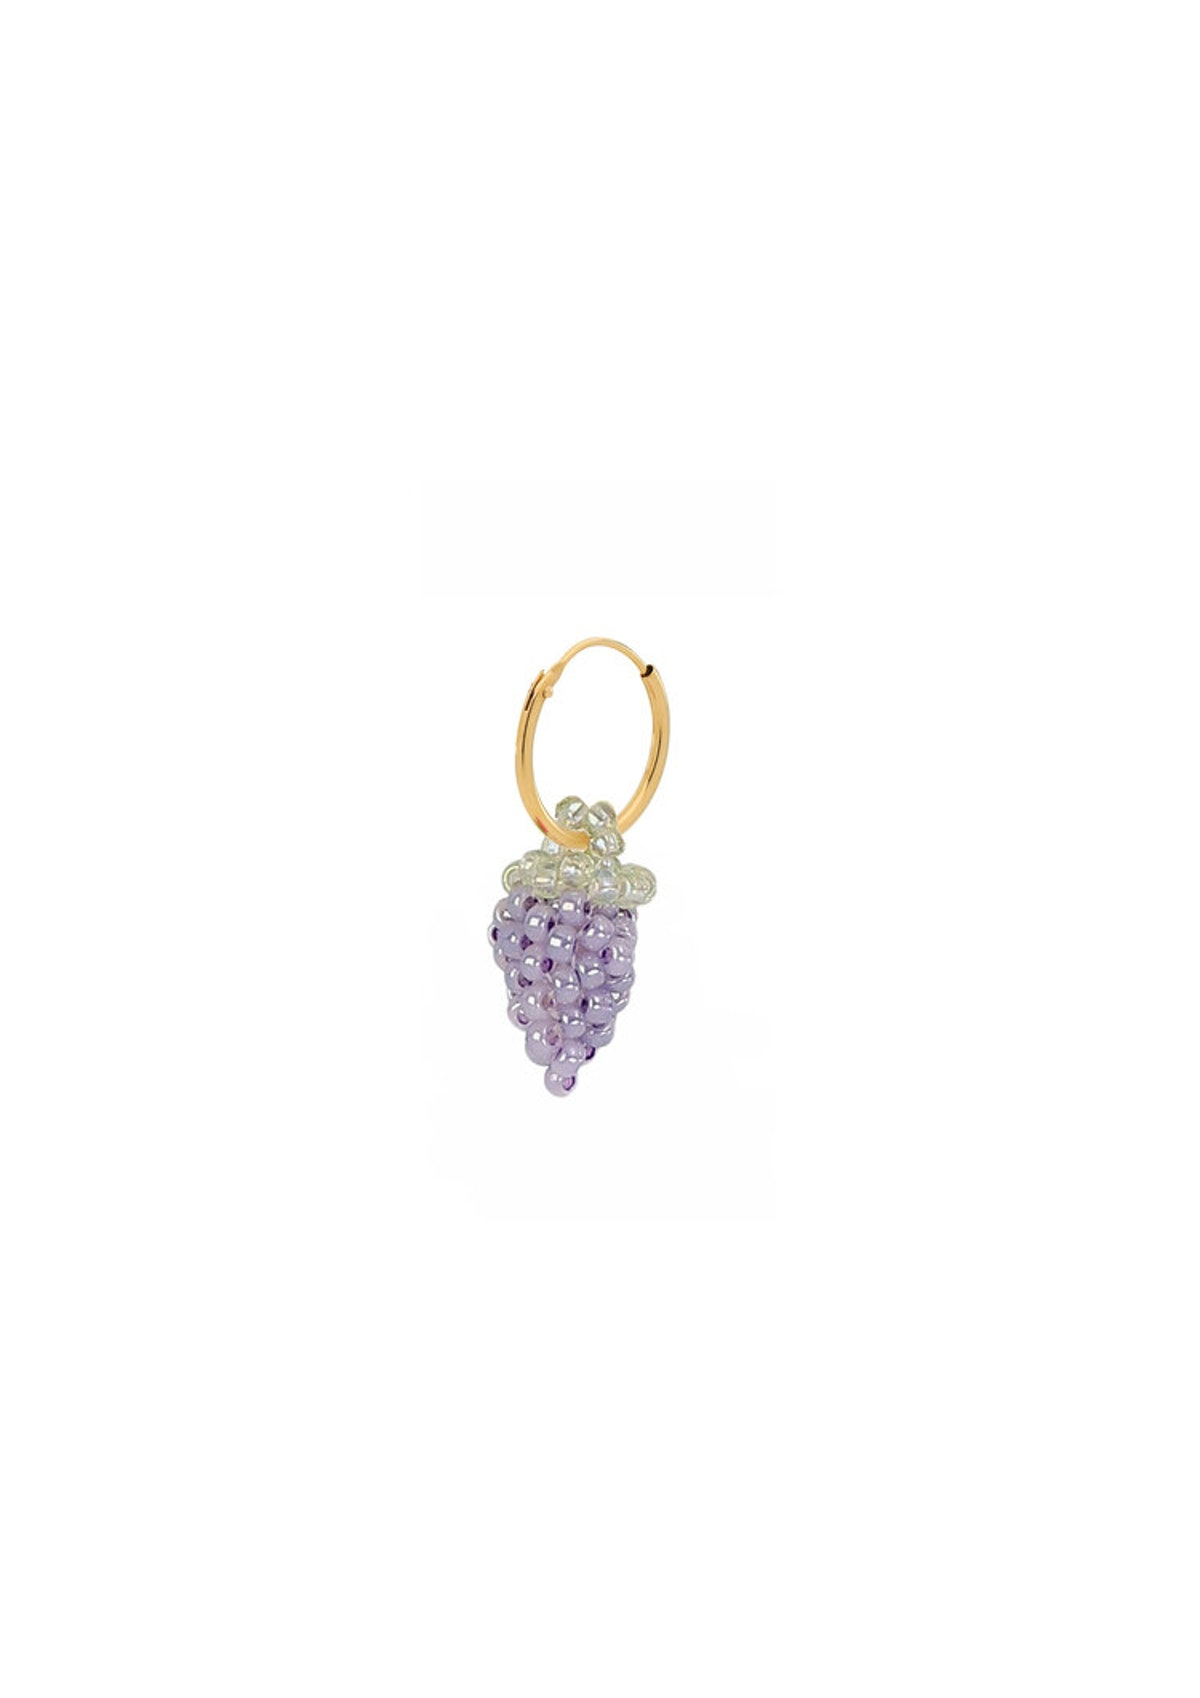 Mini Pale Grape Earring With Hoop